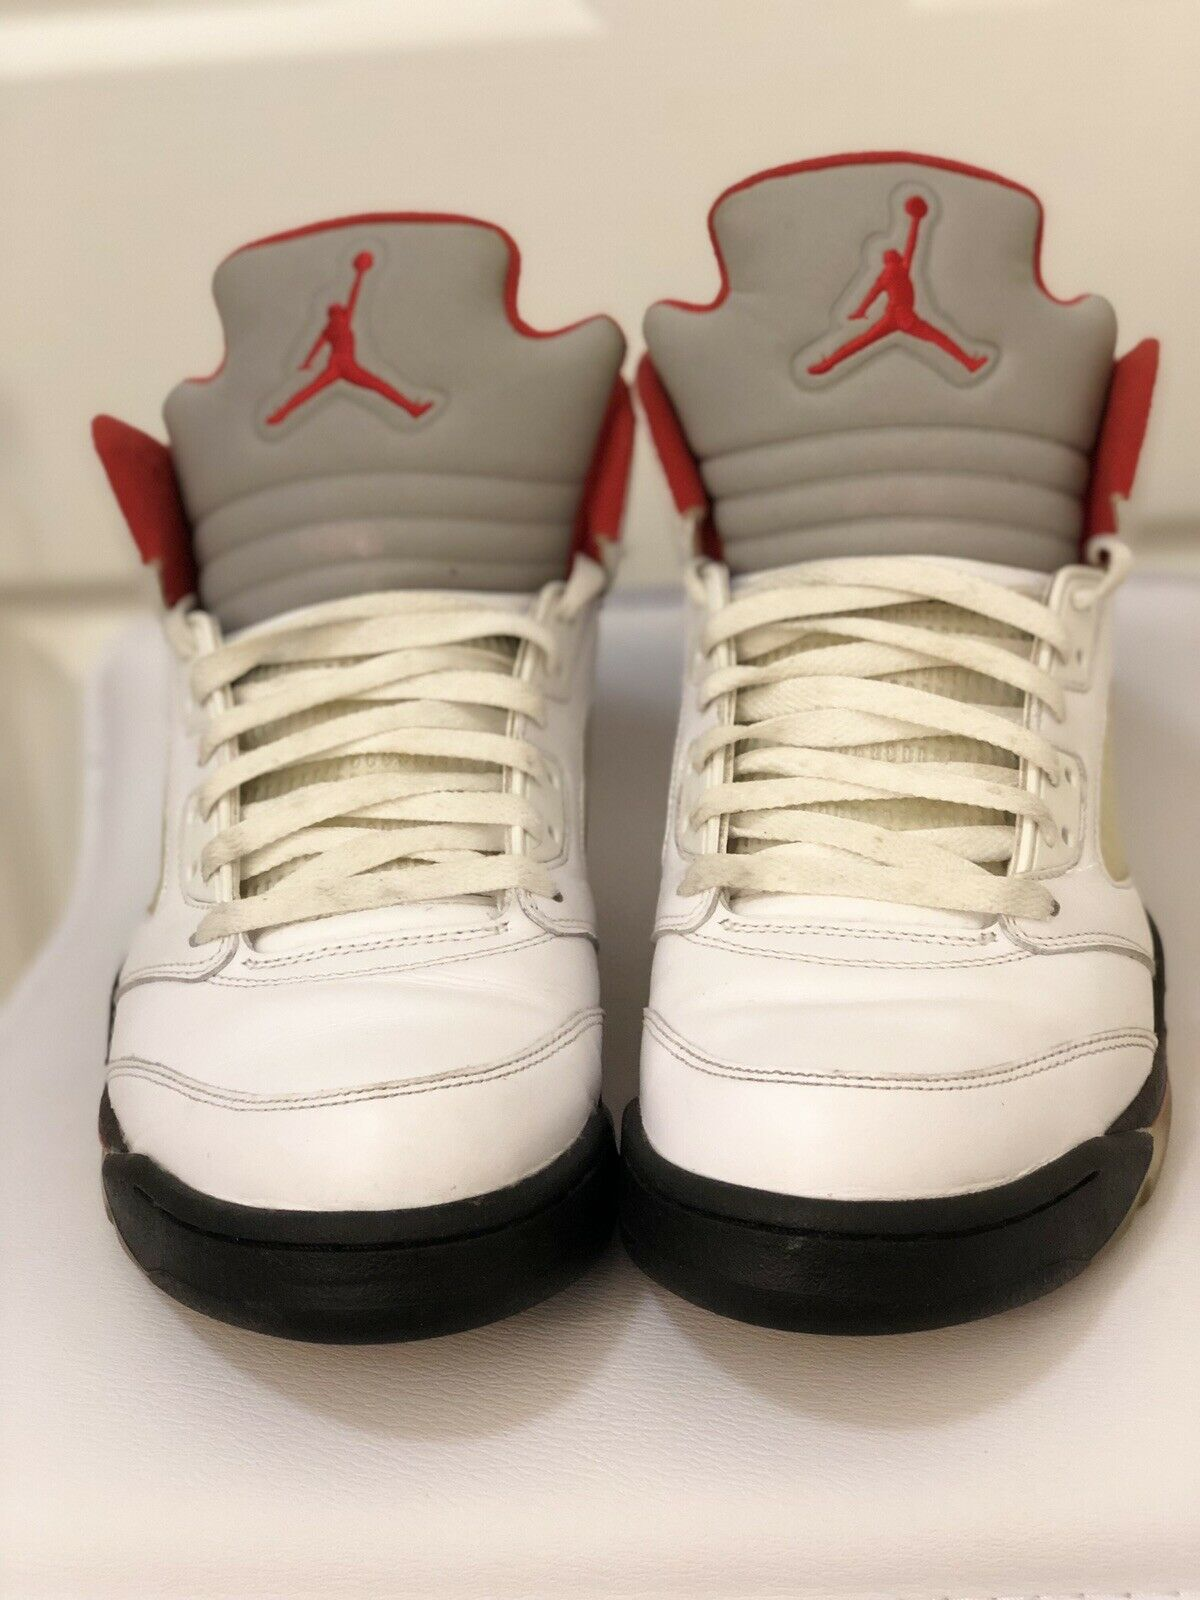 Air Jordan Retro 5 Fire Red CDP